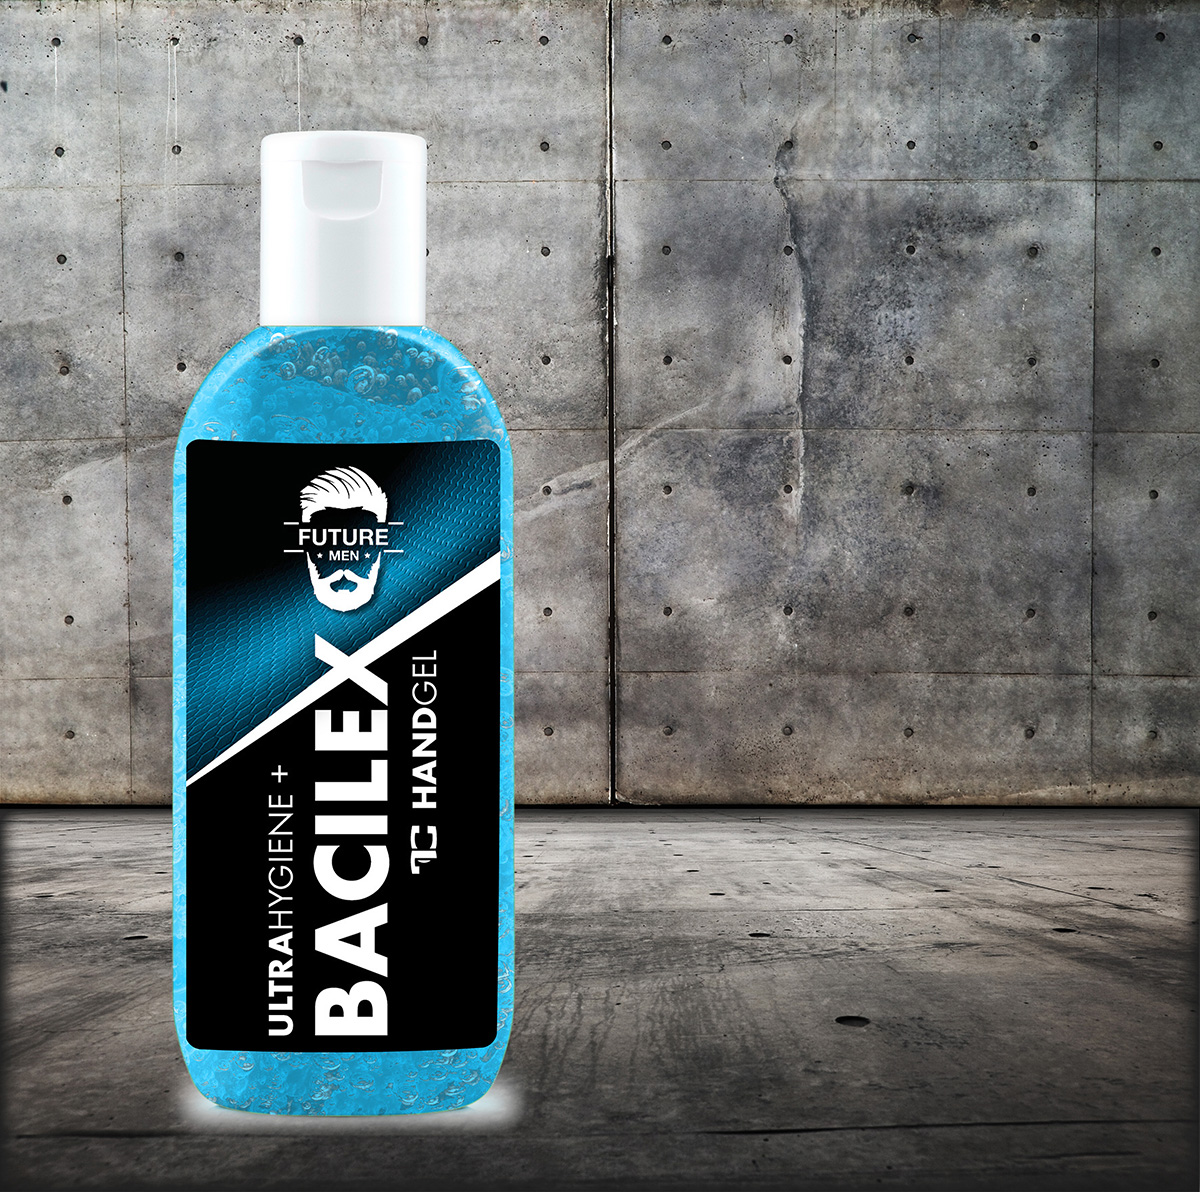 SADA 2 + 1 ZADARMO čistiaci gél na ruky PLATINUM, 65% alkoholu, handGEL BACILEX ultraHYGIENE +, 3x 100 ml